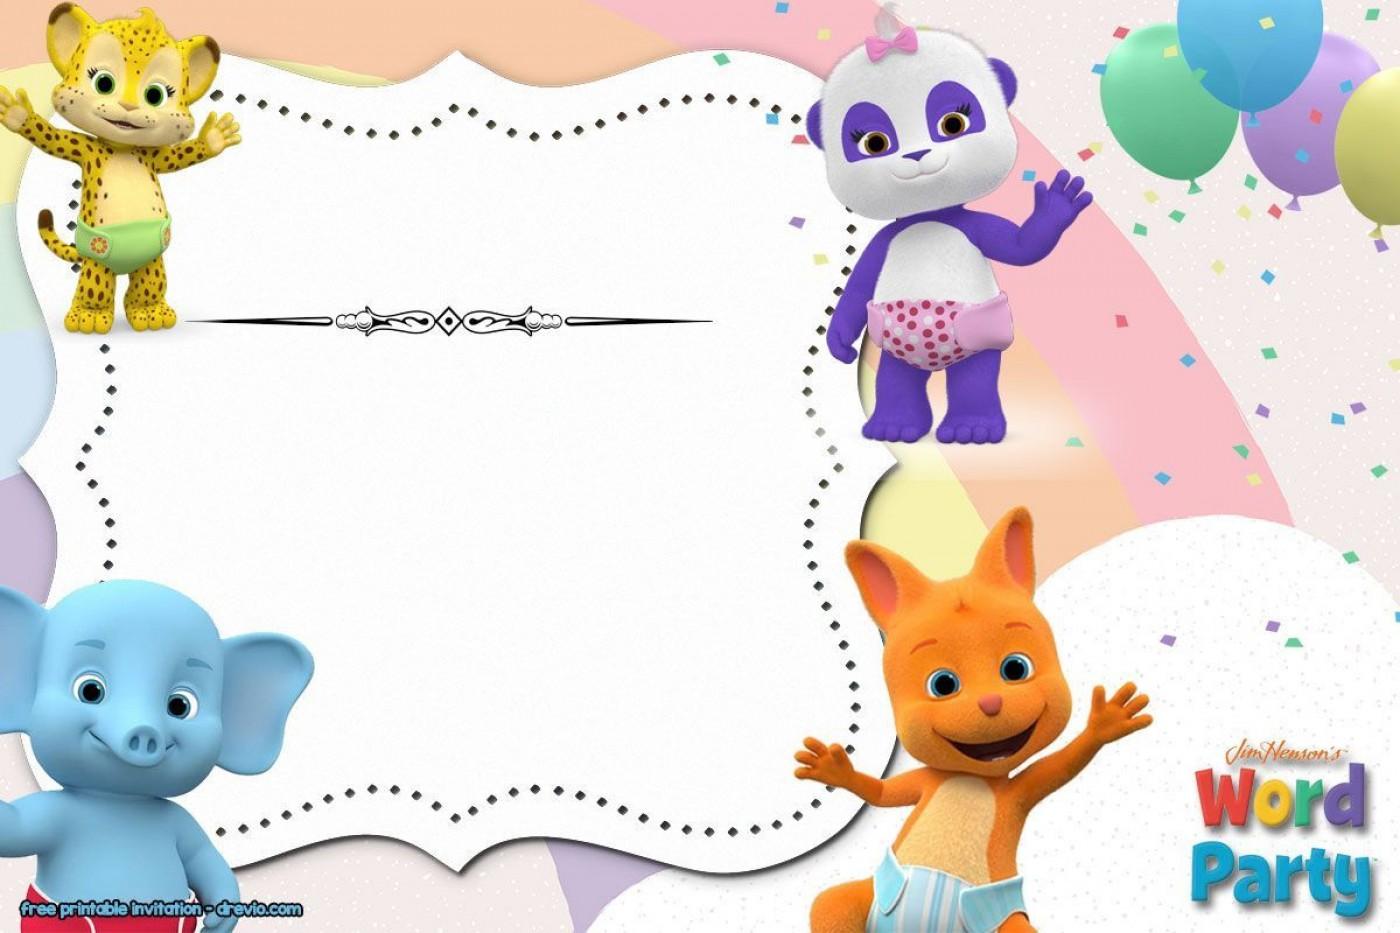 005 Surprising Microsoft Word Birthday Invitation Template Image  Editable 50th 60th1400